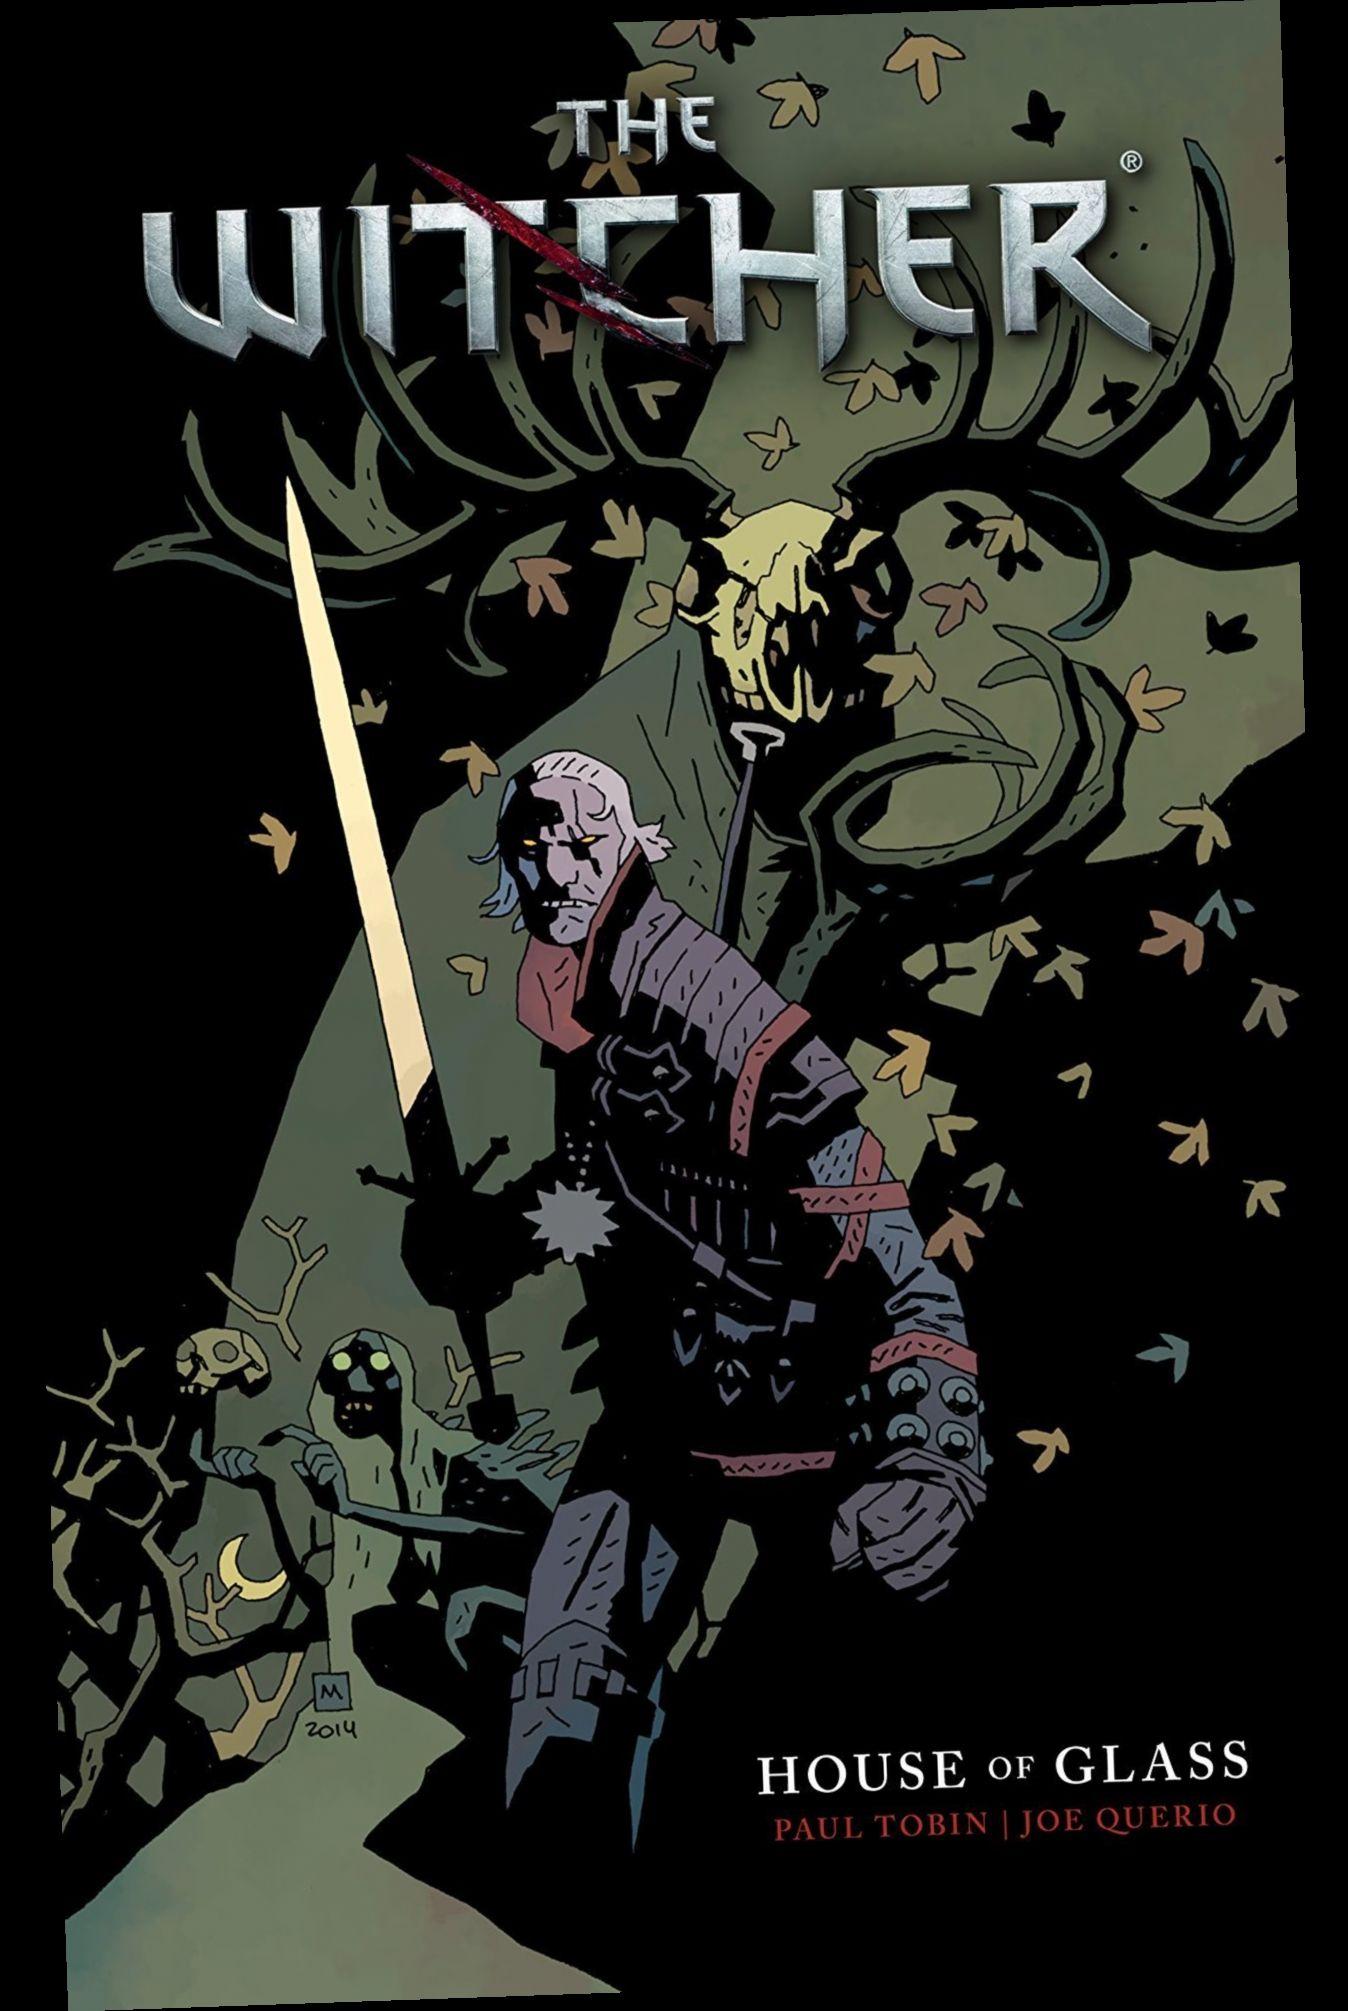 Ebook Pdf Epub Download The Witcher Vol 1 House Of Glass By Paul Tobin Komiksy Artbuki